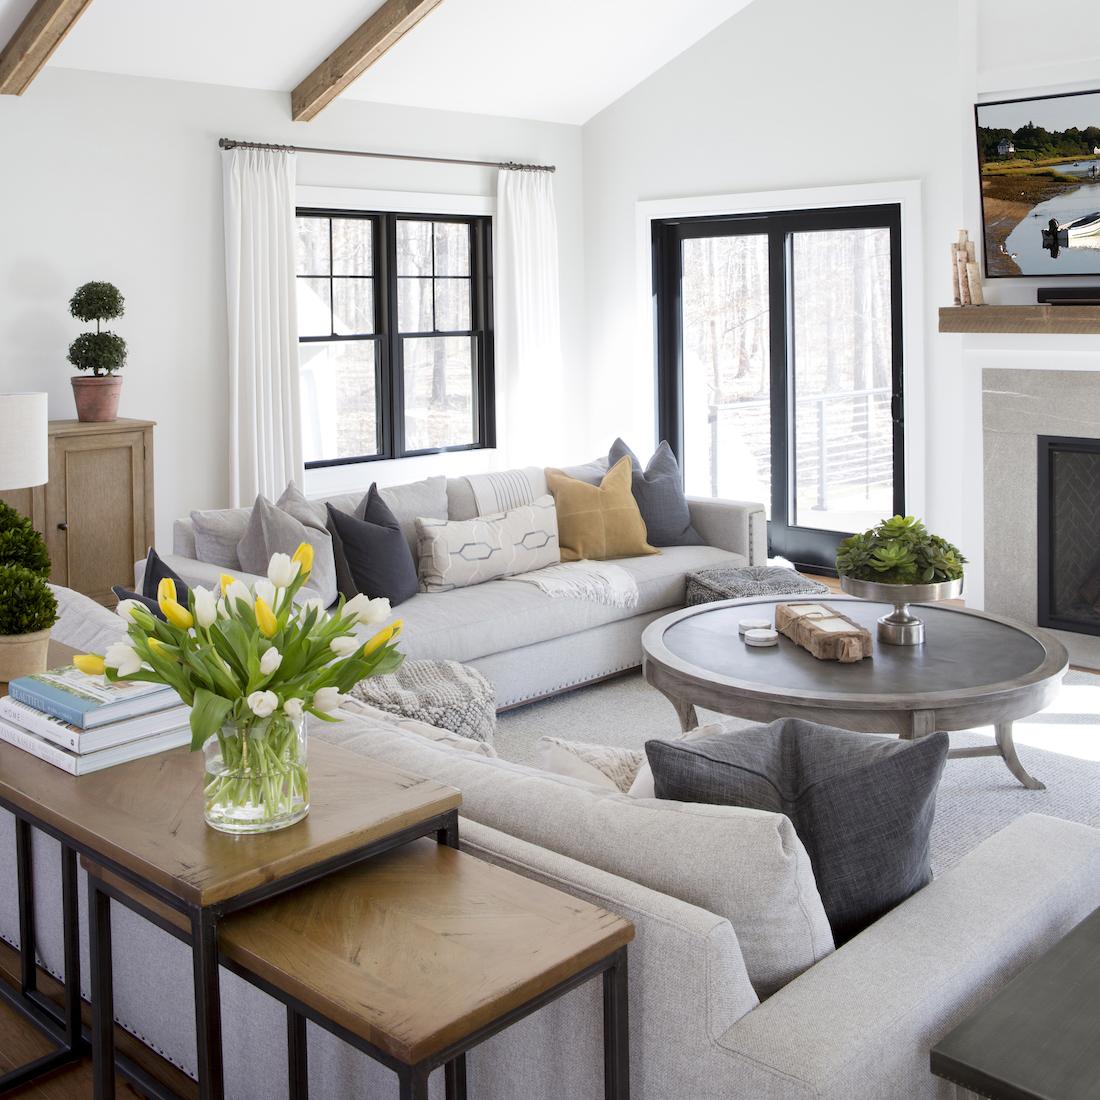 living-room-interior-design-karin-eckerson-interiors-princeton-nj